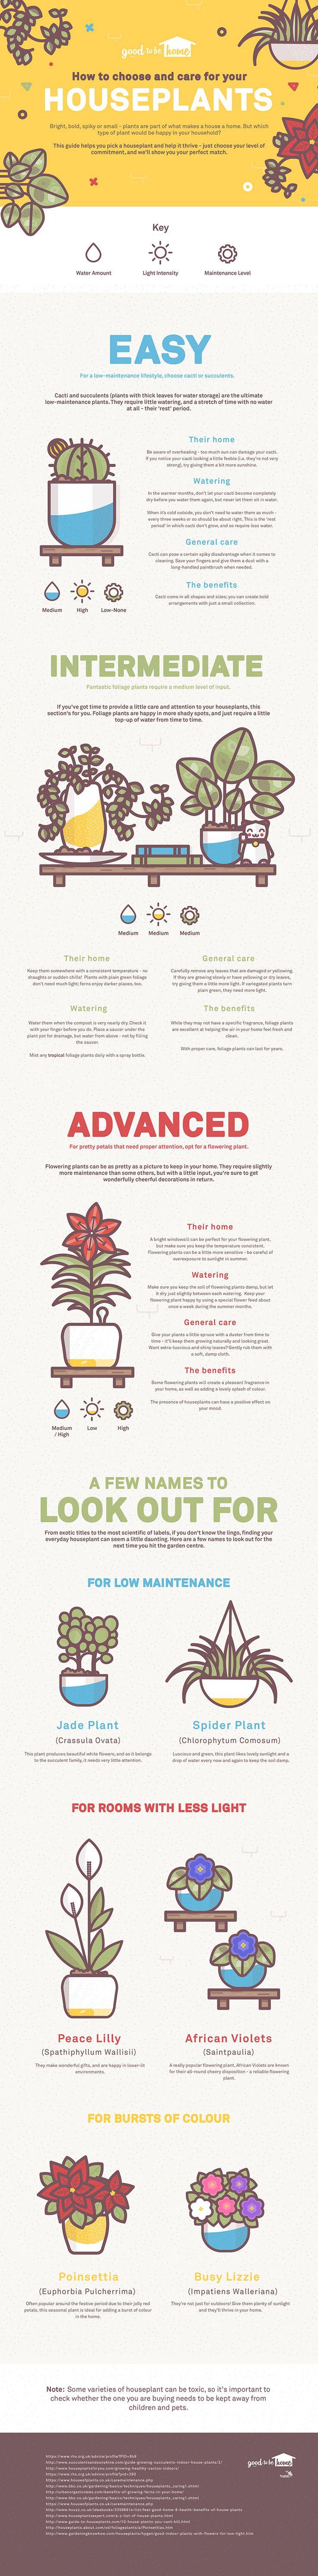 Anglian's Guide to Keeping Houseplants